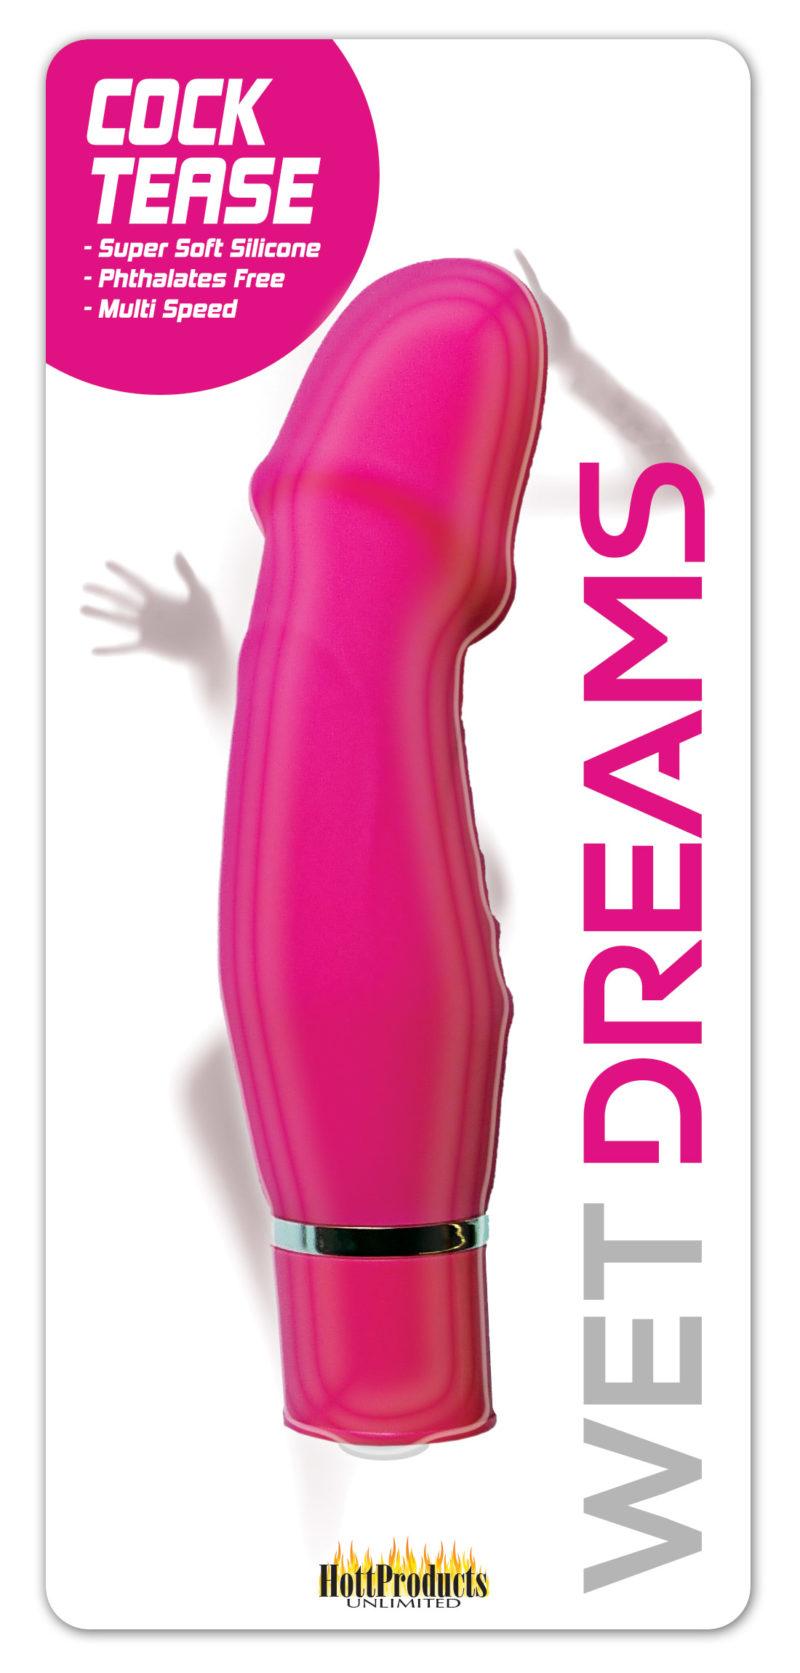 Hott Products Wet Dreams Cock Tease Vibrator